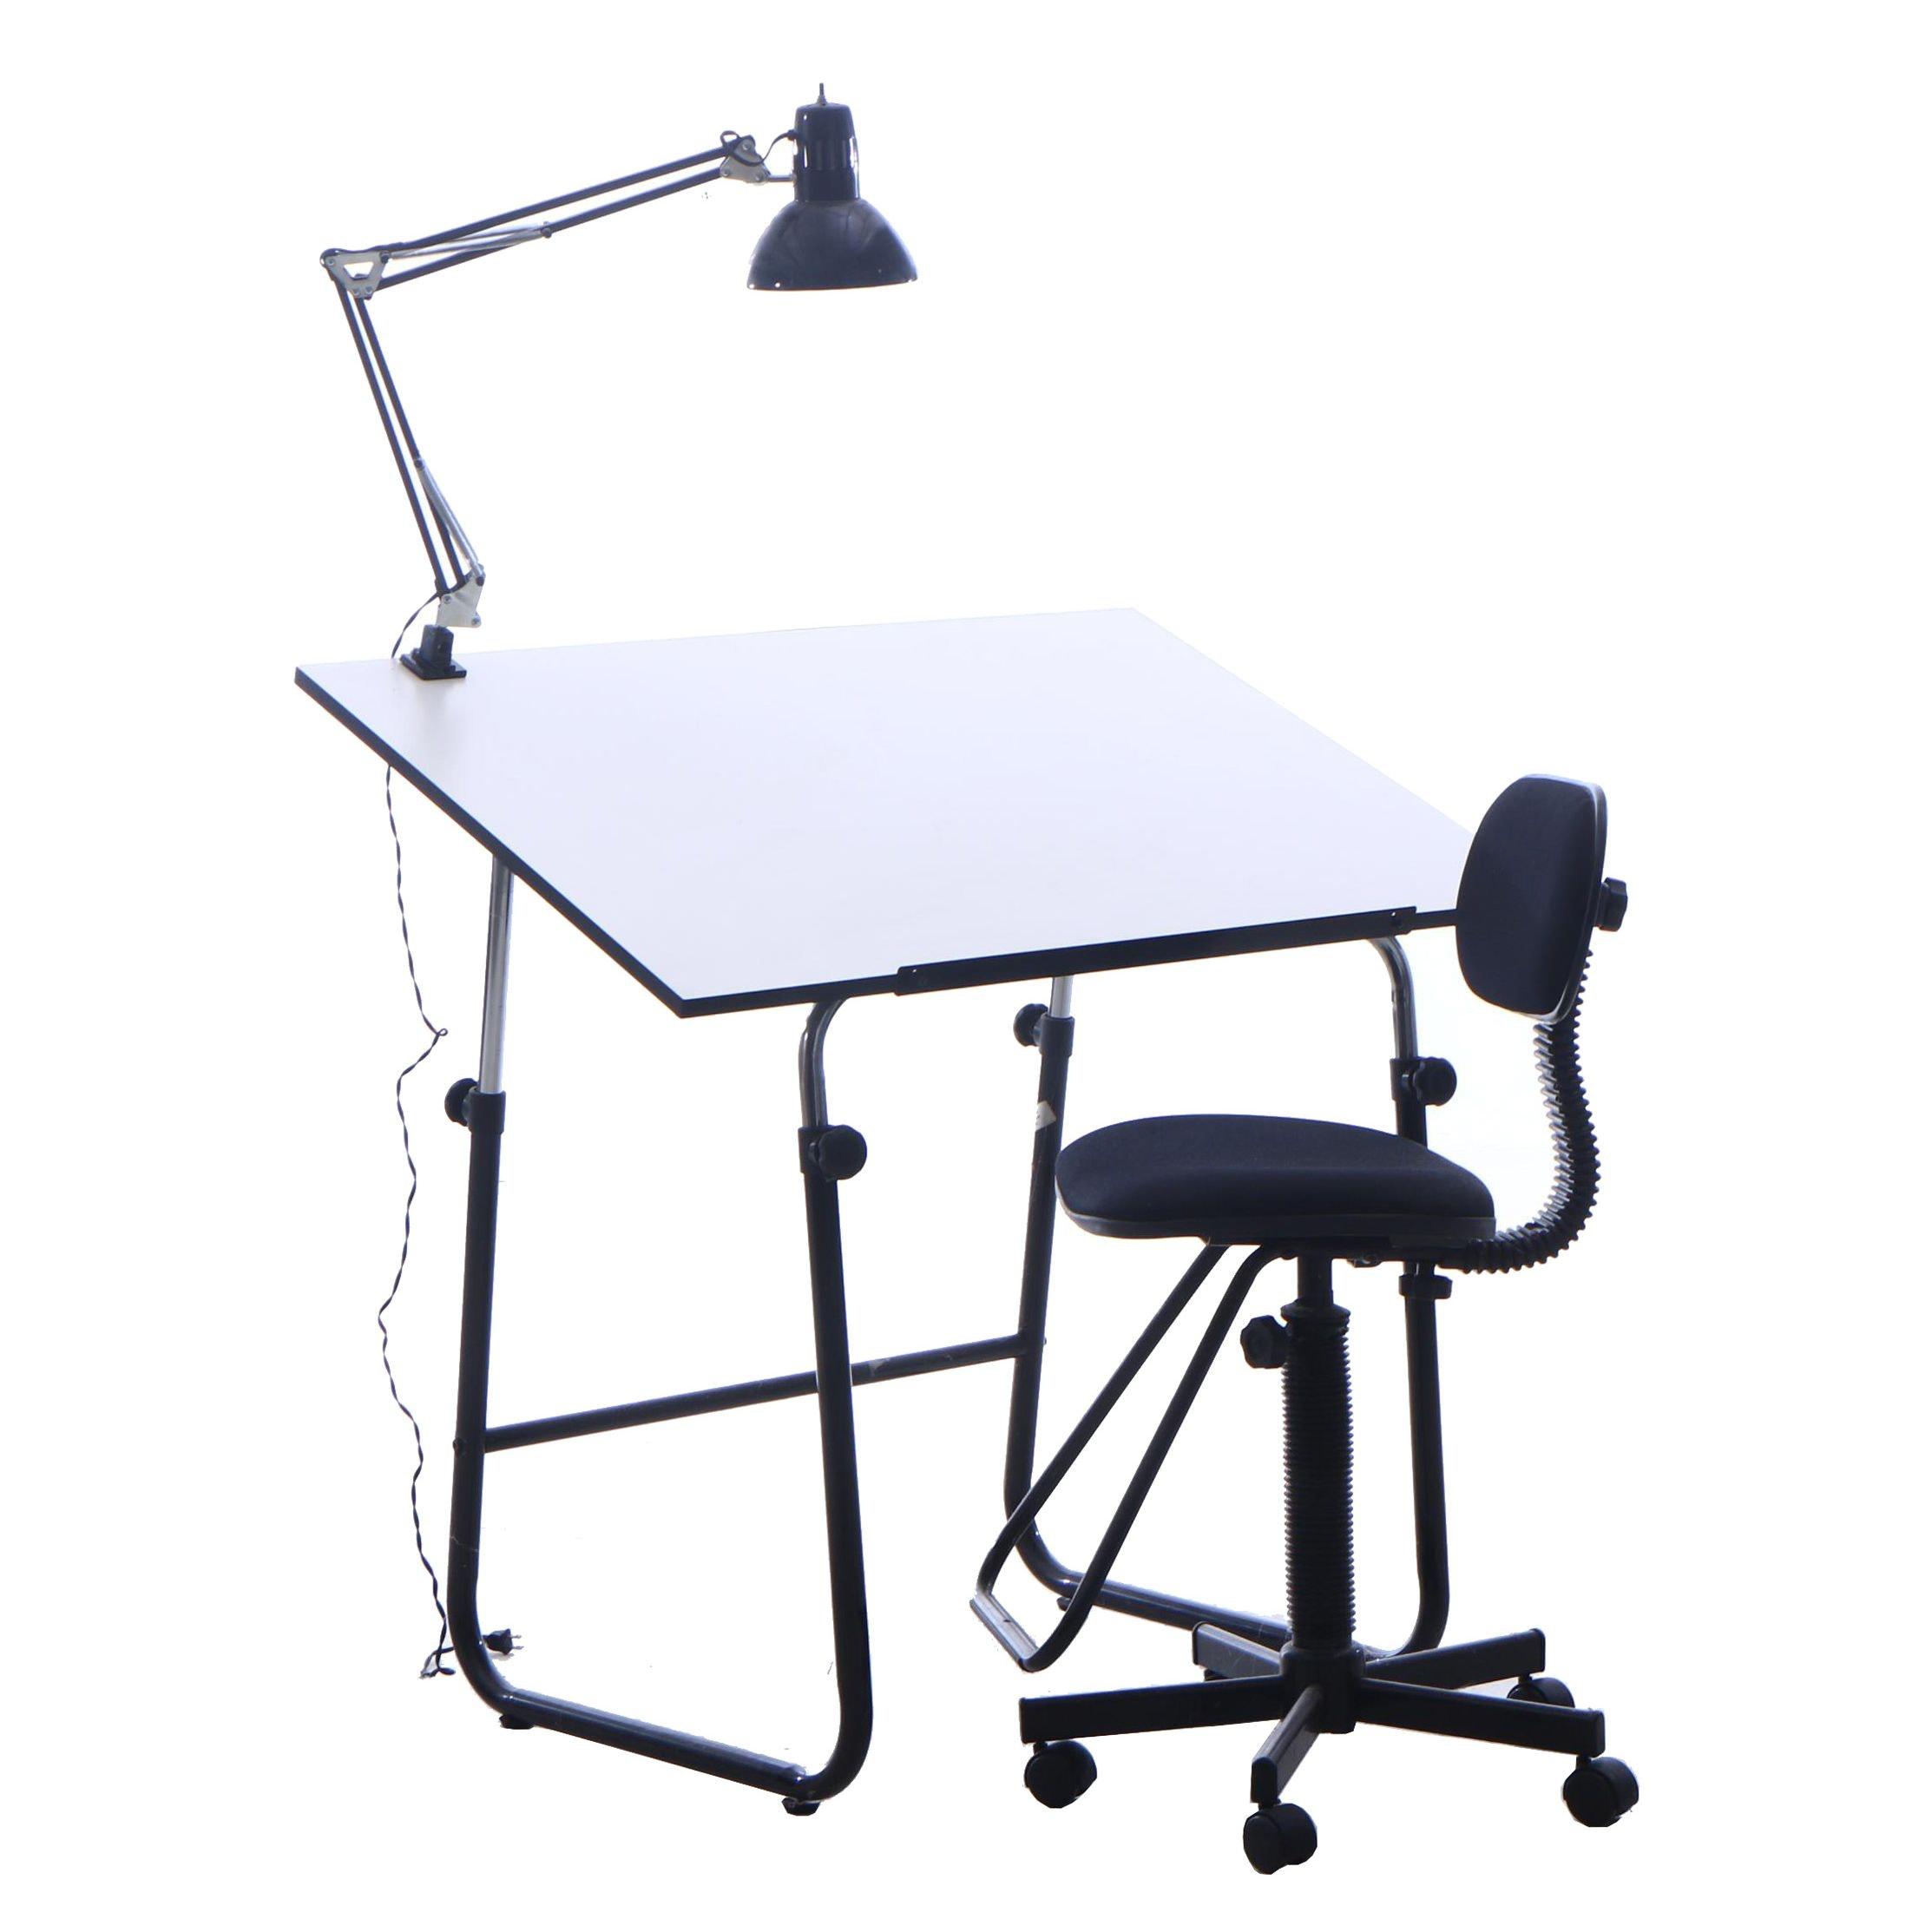 Studio Art Tilt Top Drafting Table, Desk Chair and Table Mount Directional Lamp